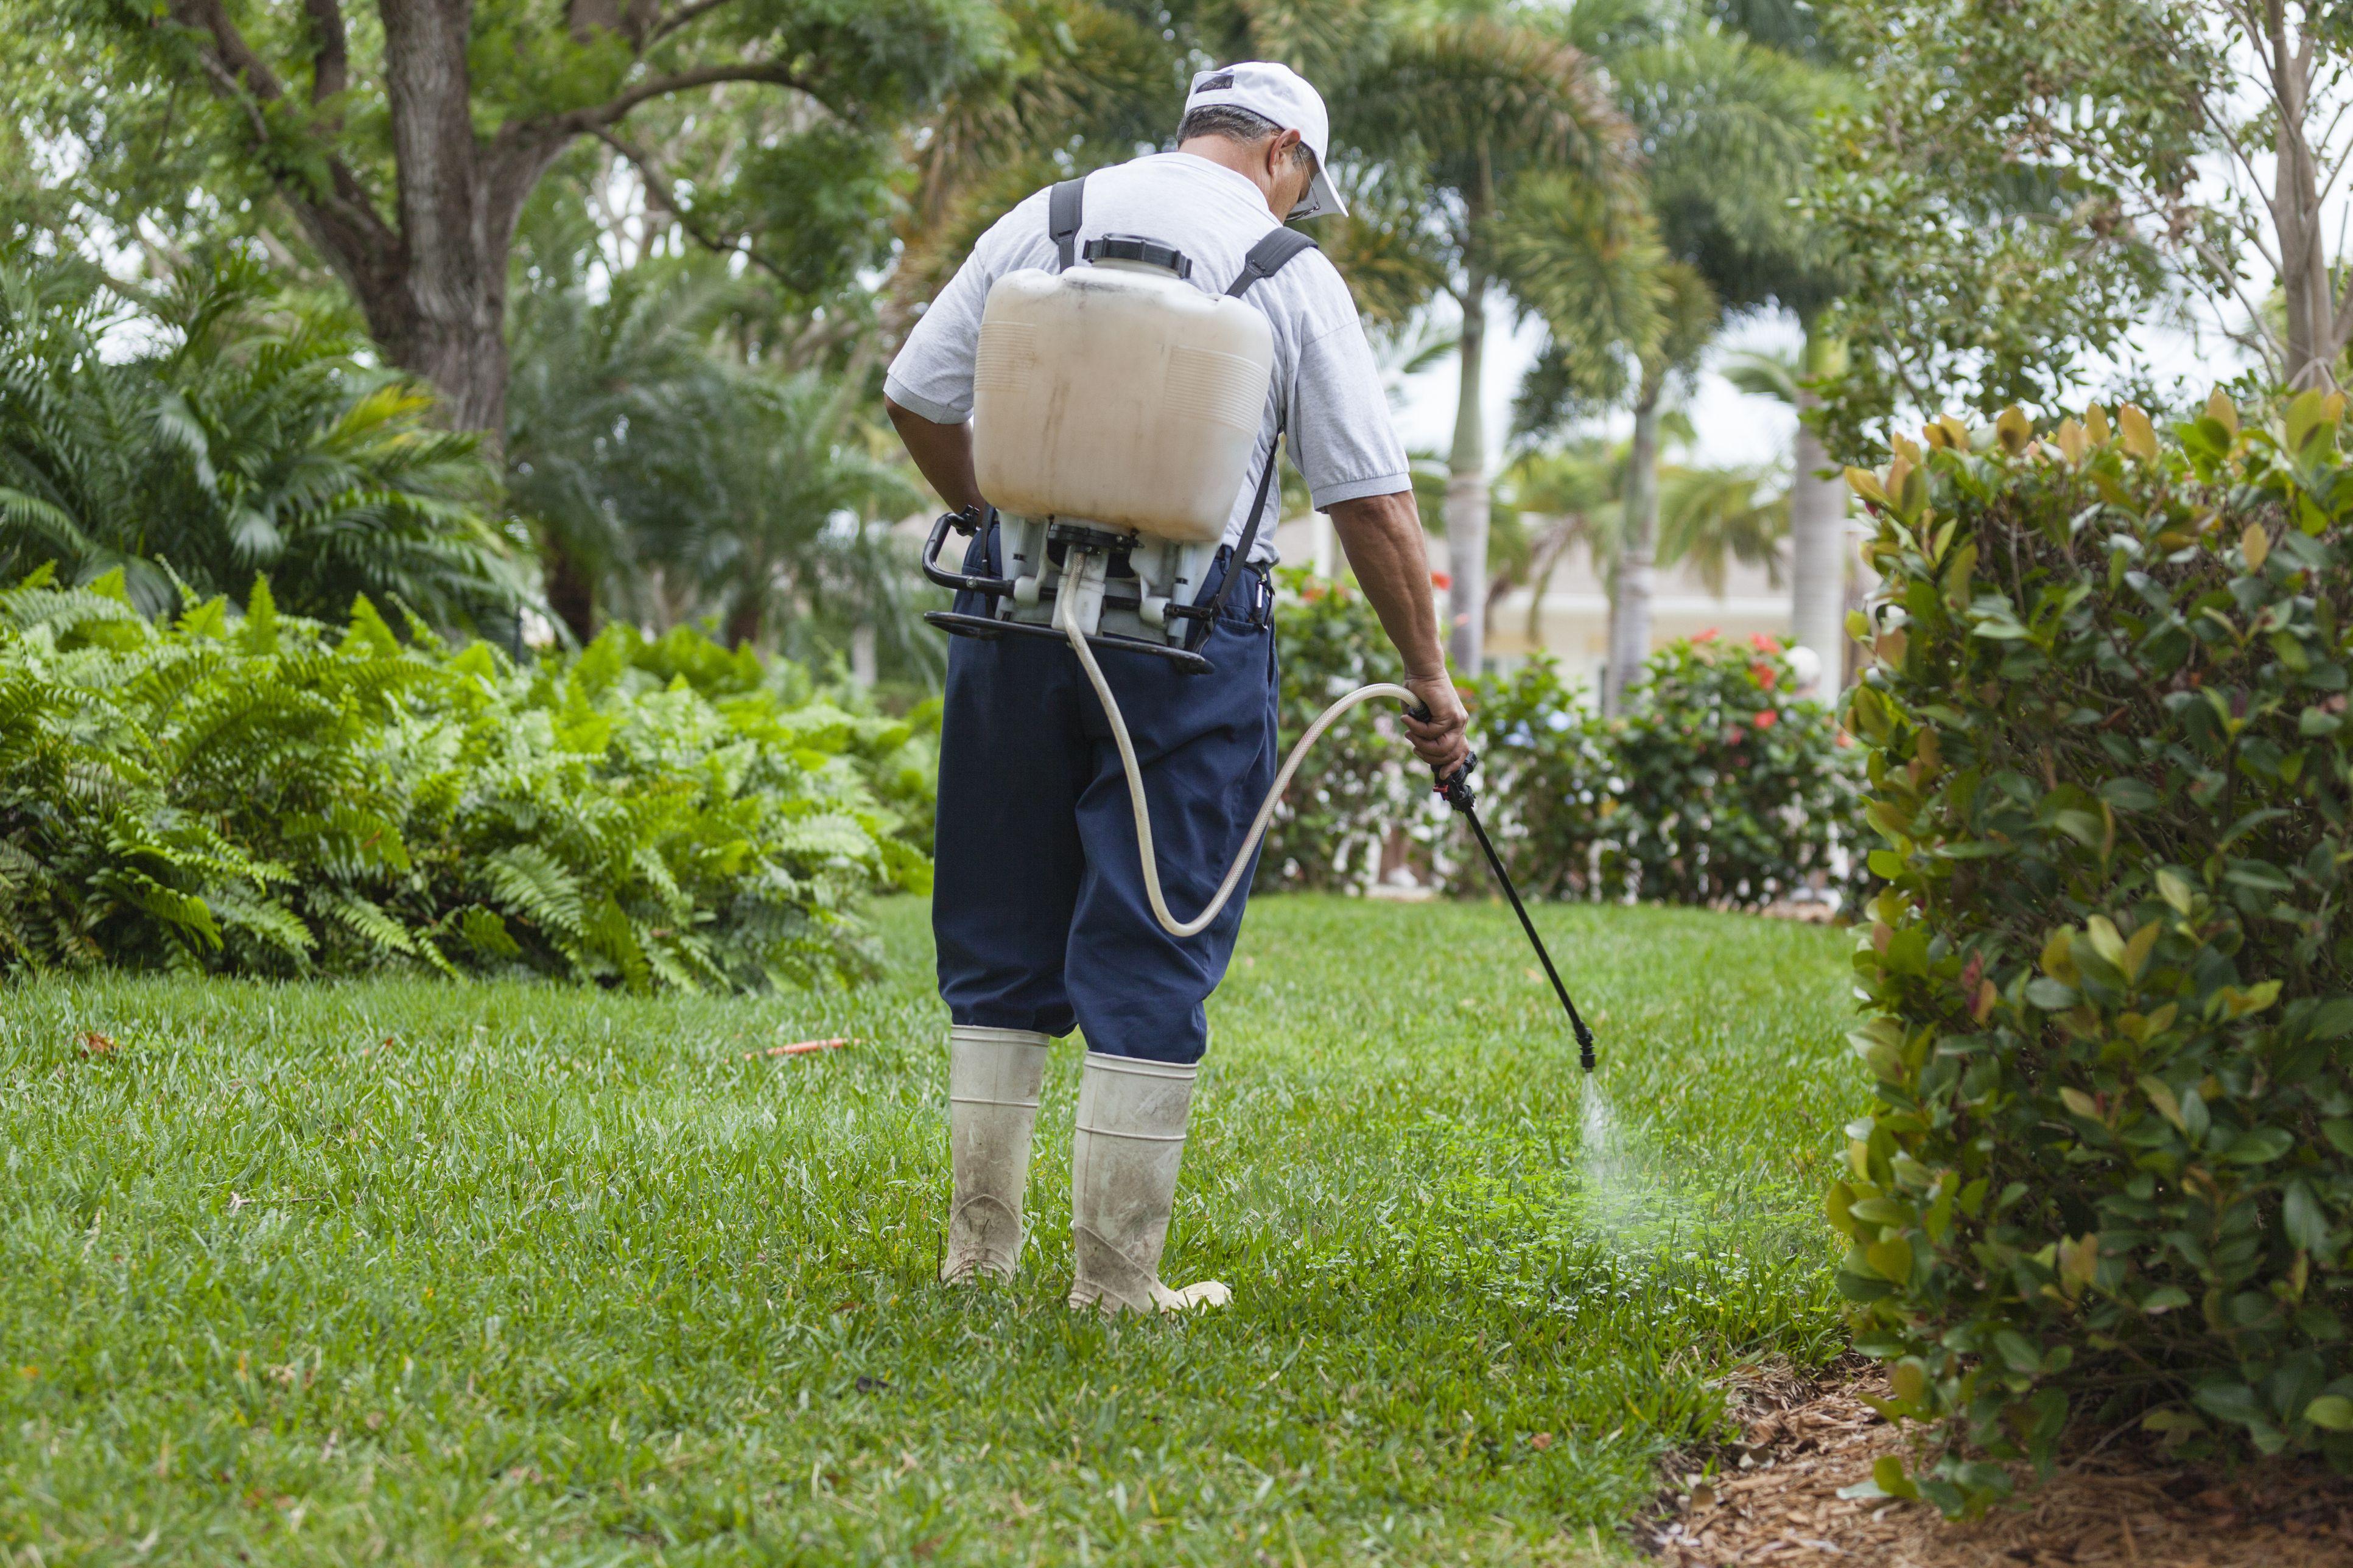 Broadleaf Weed Control The Organic Way